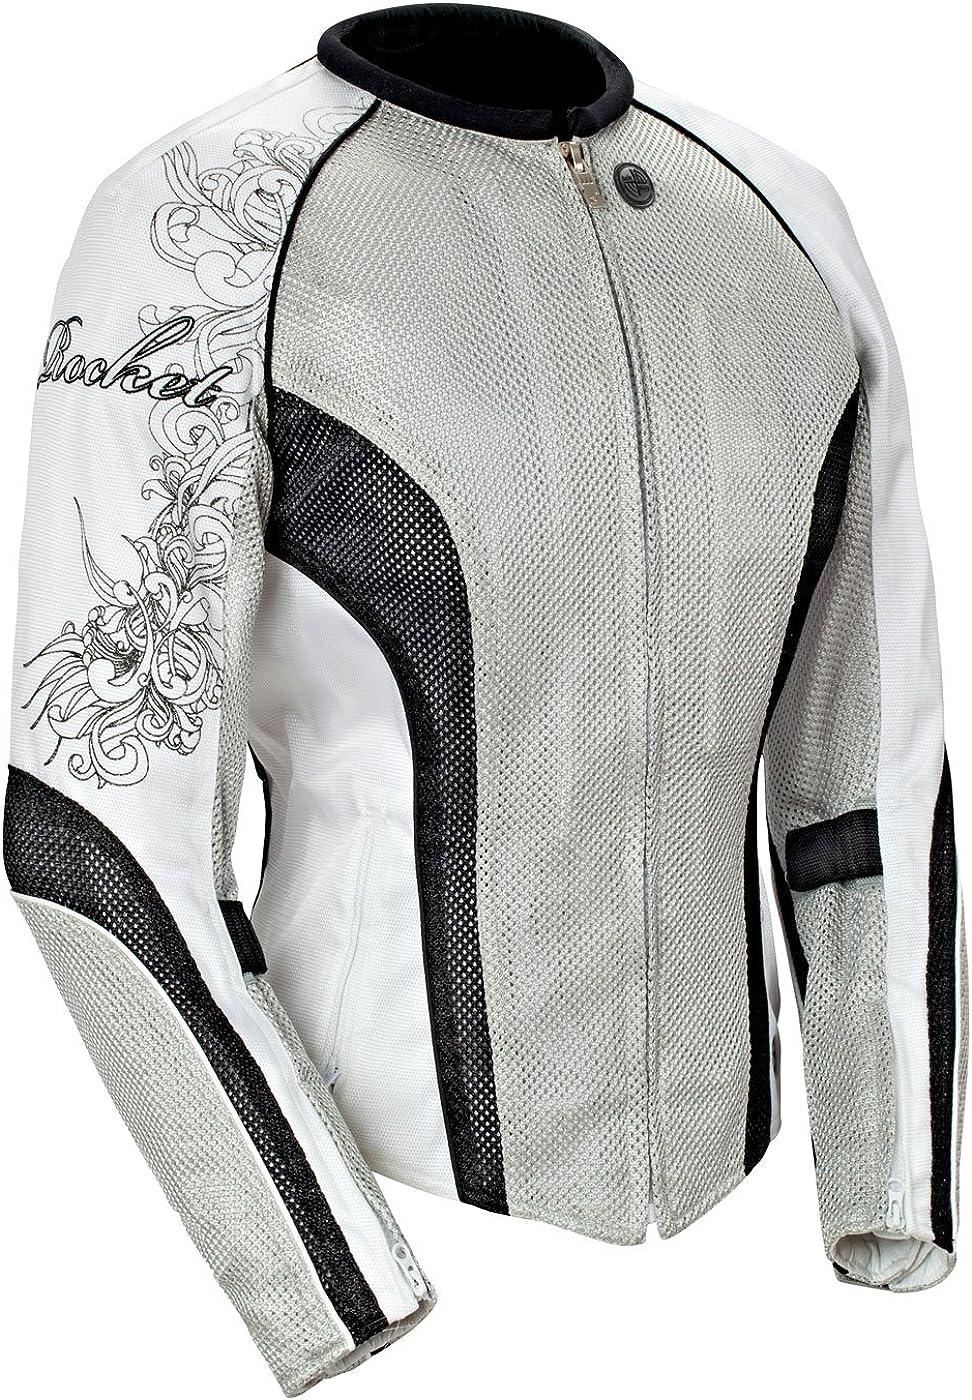 Joe Rocket Cleo 2.2 Latest item Women's Riding Mesh Jacket Motorcycle Ranking TOP1